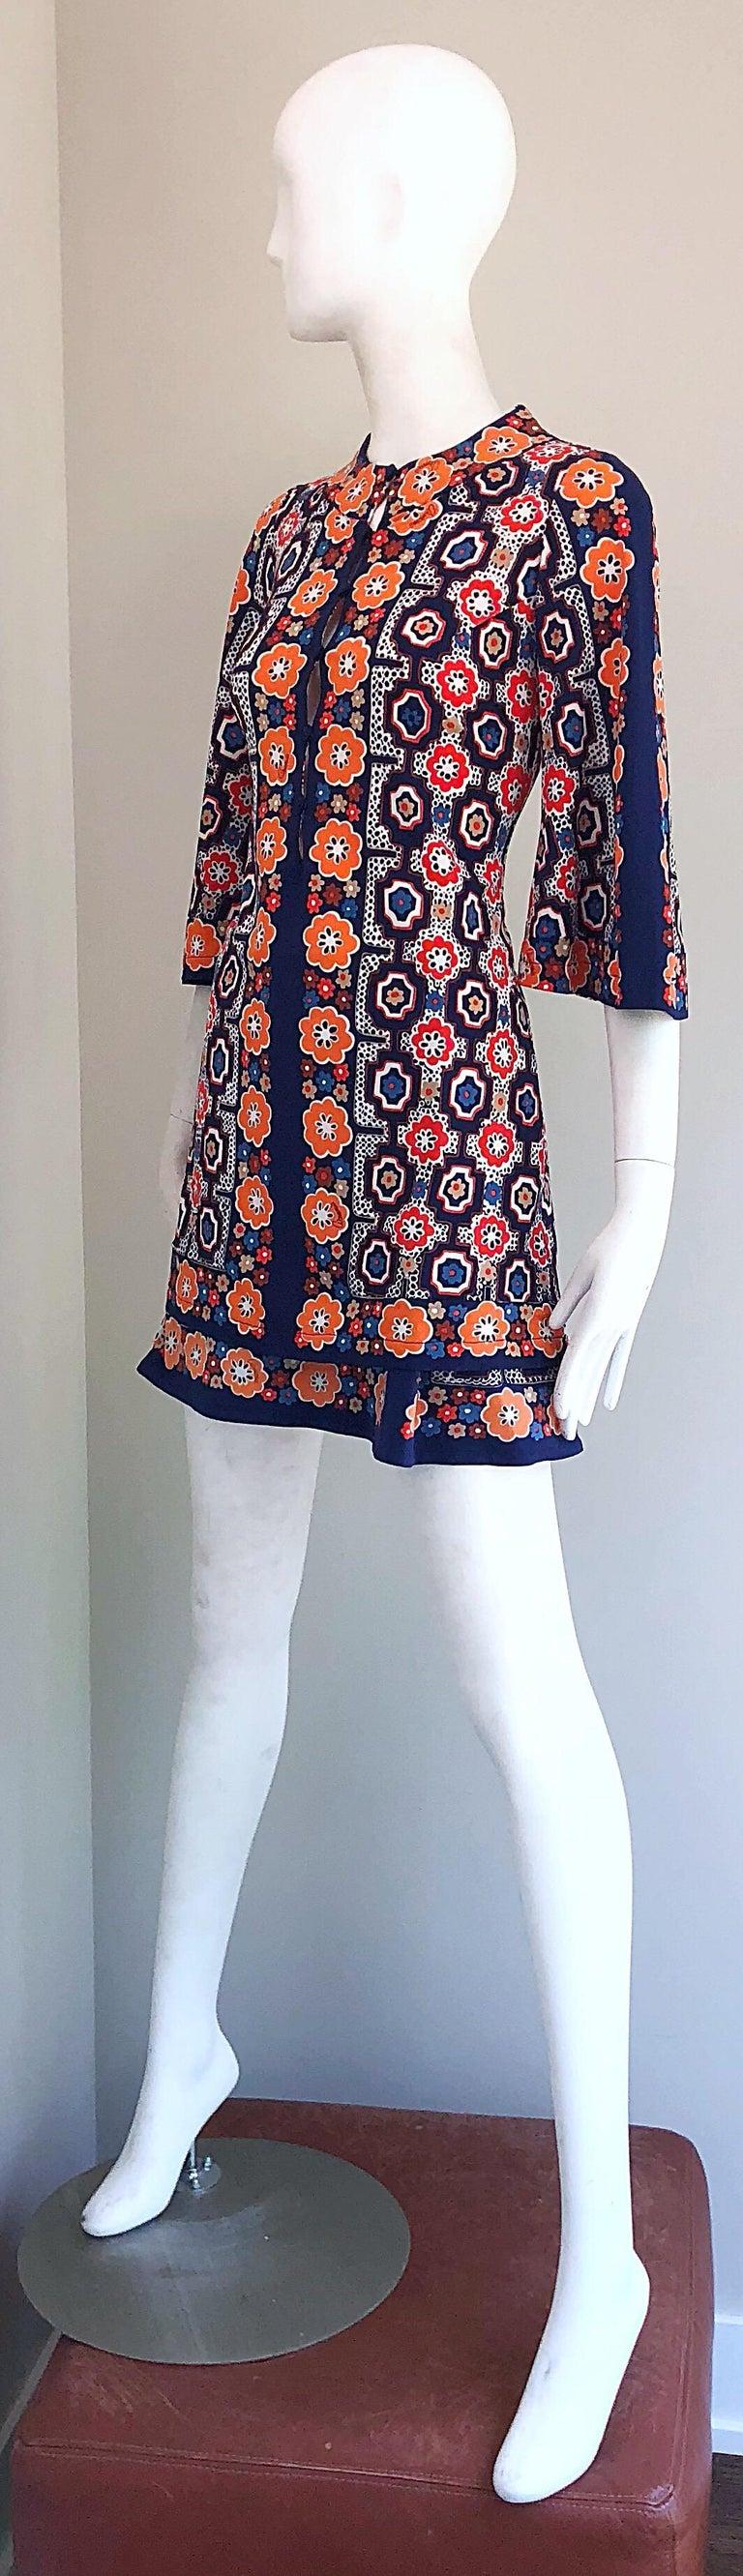 1960s Armonia Italian Jersey Bell Sleeve Vintage 60s Mod Tunic + Mini Skirt For Sale 10